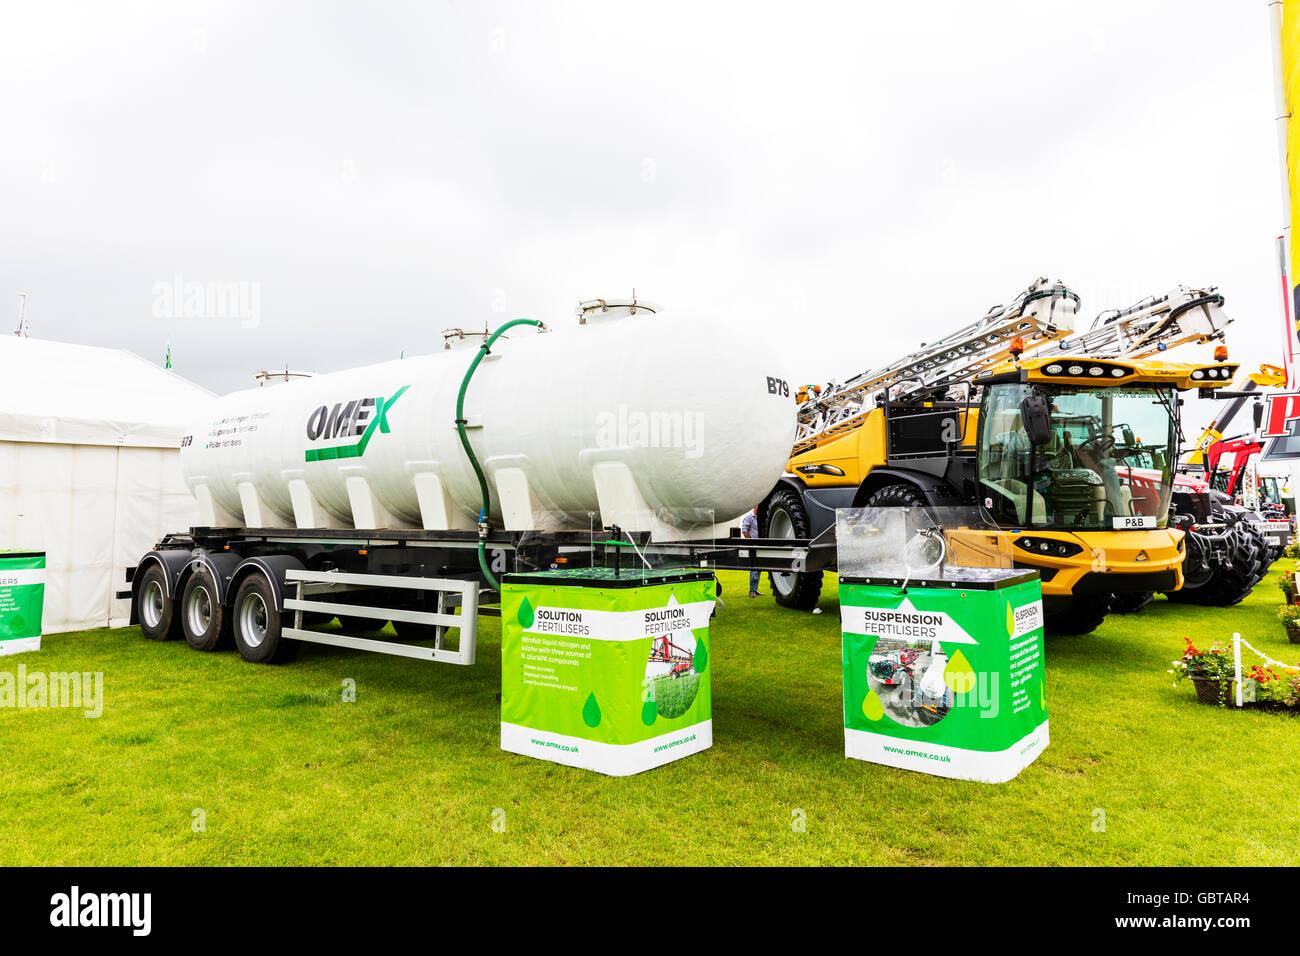 Suspension fertiliser fertilizer sprayer spreader tank farm machinery agriculture UK England GB - Stock Image